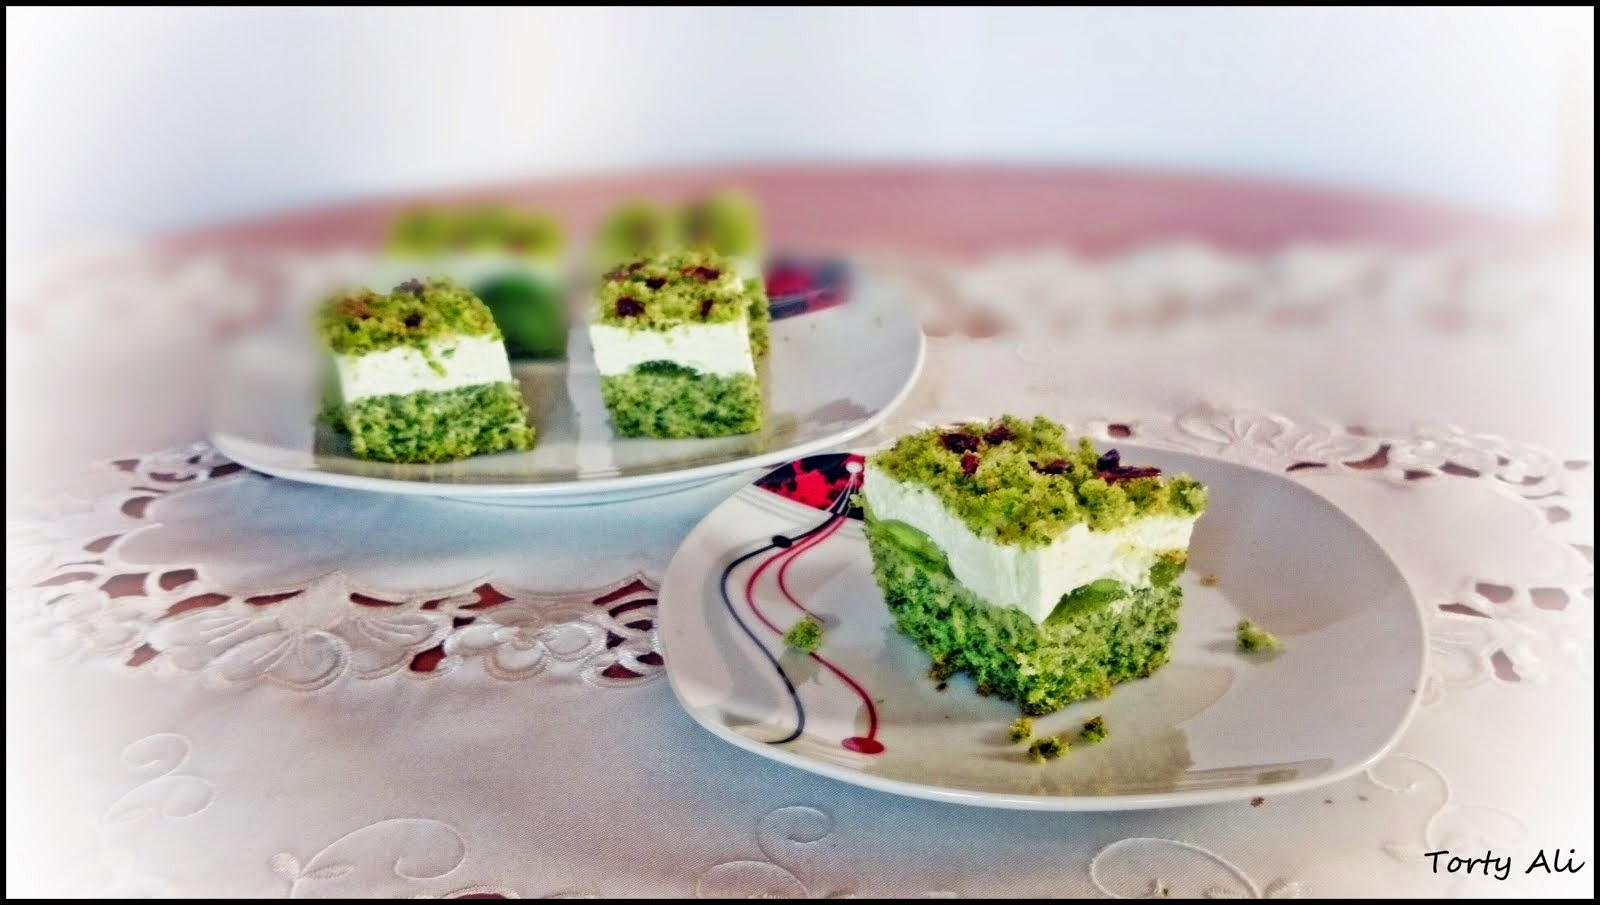 Mech-ciasto szpinakowe